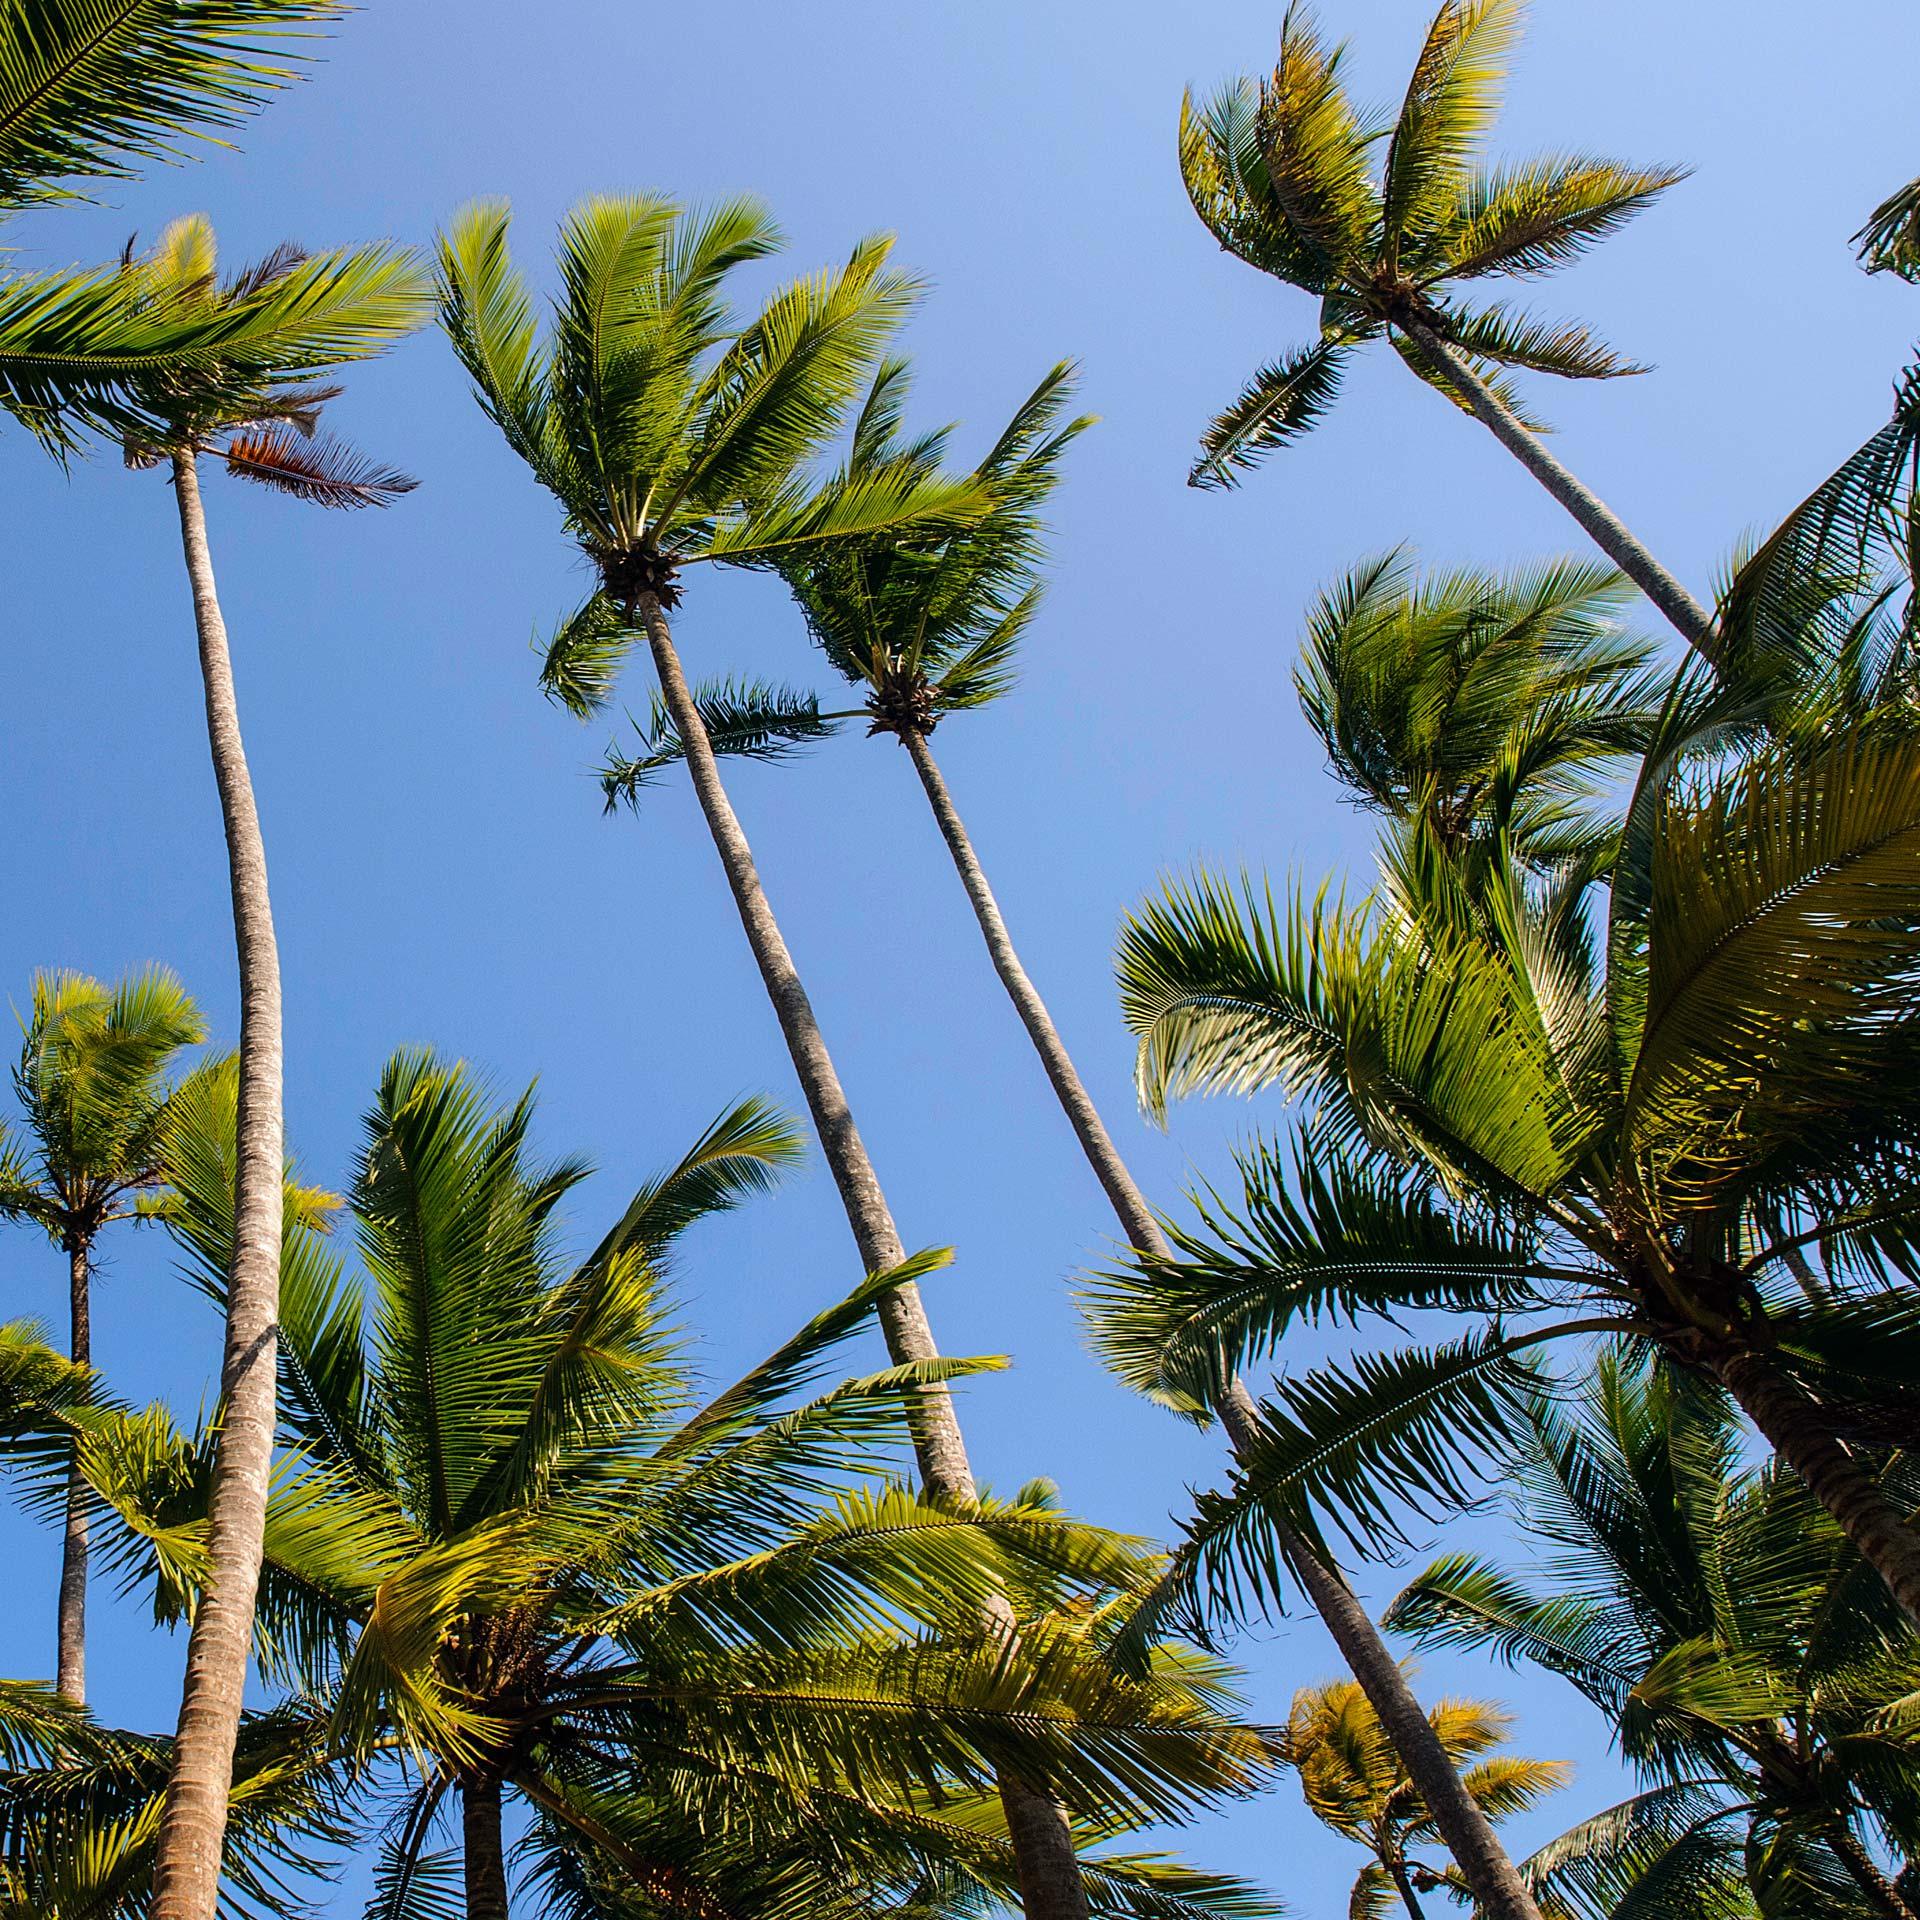 kingsland-linassi-pearl-island-palms